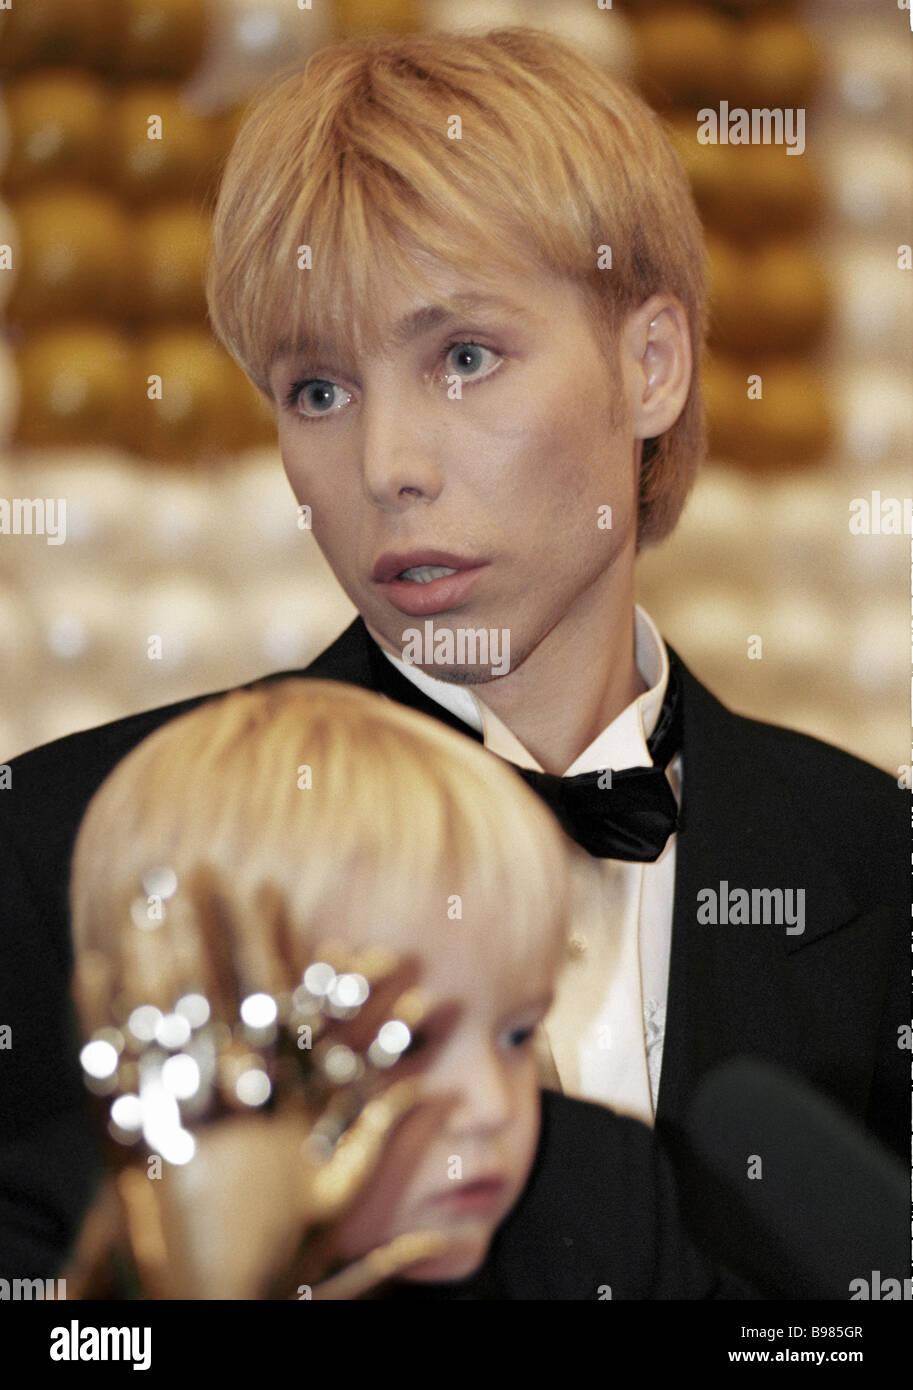 Stock Photo - Top stylist Sergei Zverev attends sixth official Ovatsiya awards ceremony - top-stylist-sergei-zverev-attends-sixth-official-ovatsiya-awards-ceremony-B985GR